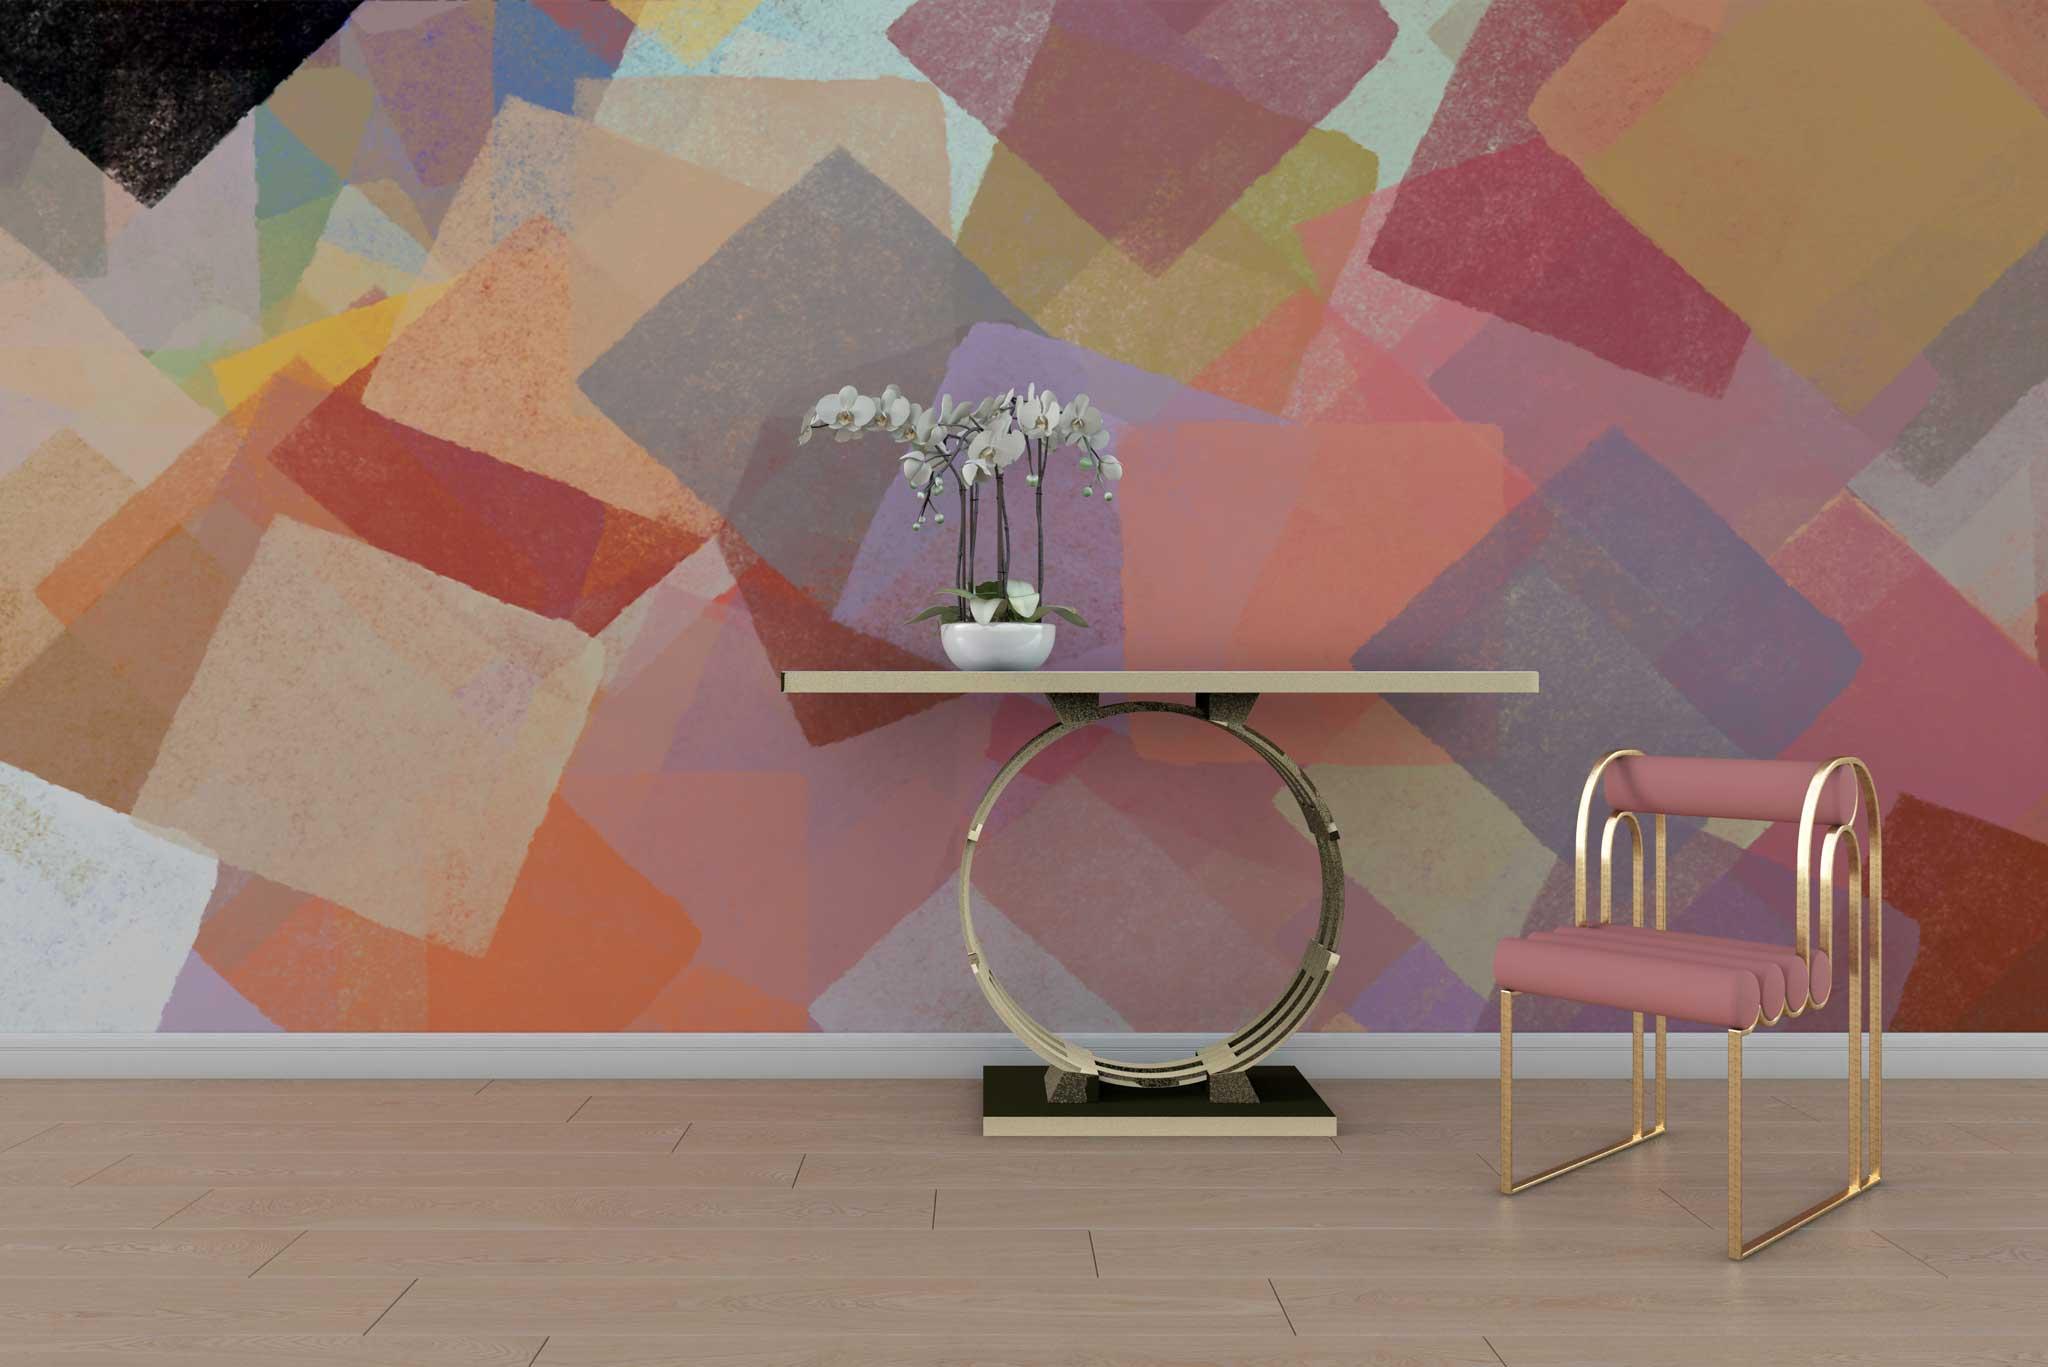 tapet-fototapet-design-interior-personalizat-comanda-special-bucuresti-motiv-geometric-grafic-multicolor-colorat-patrate